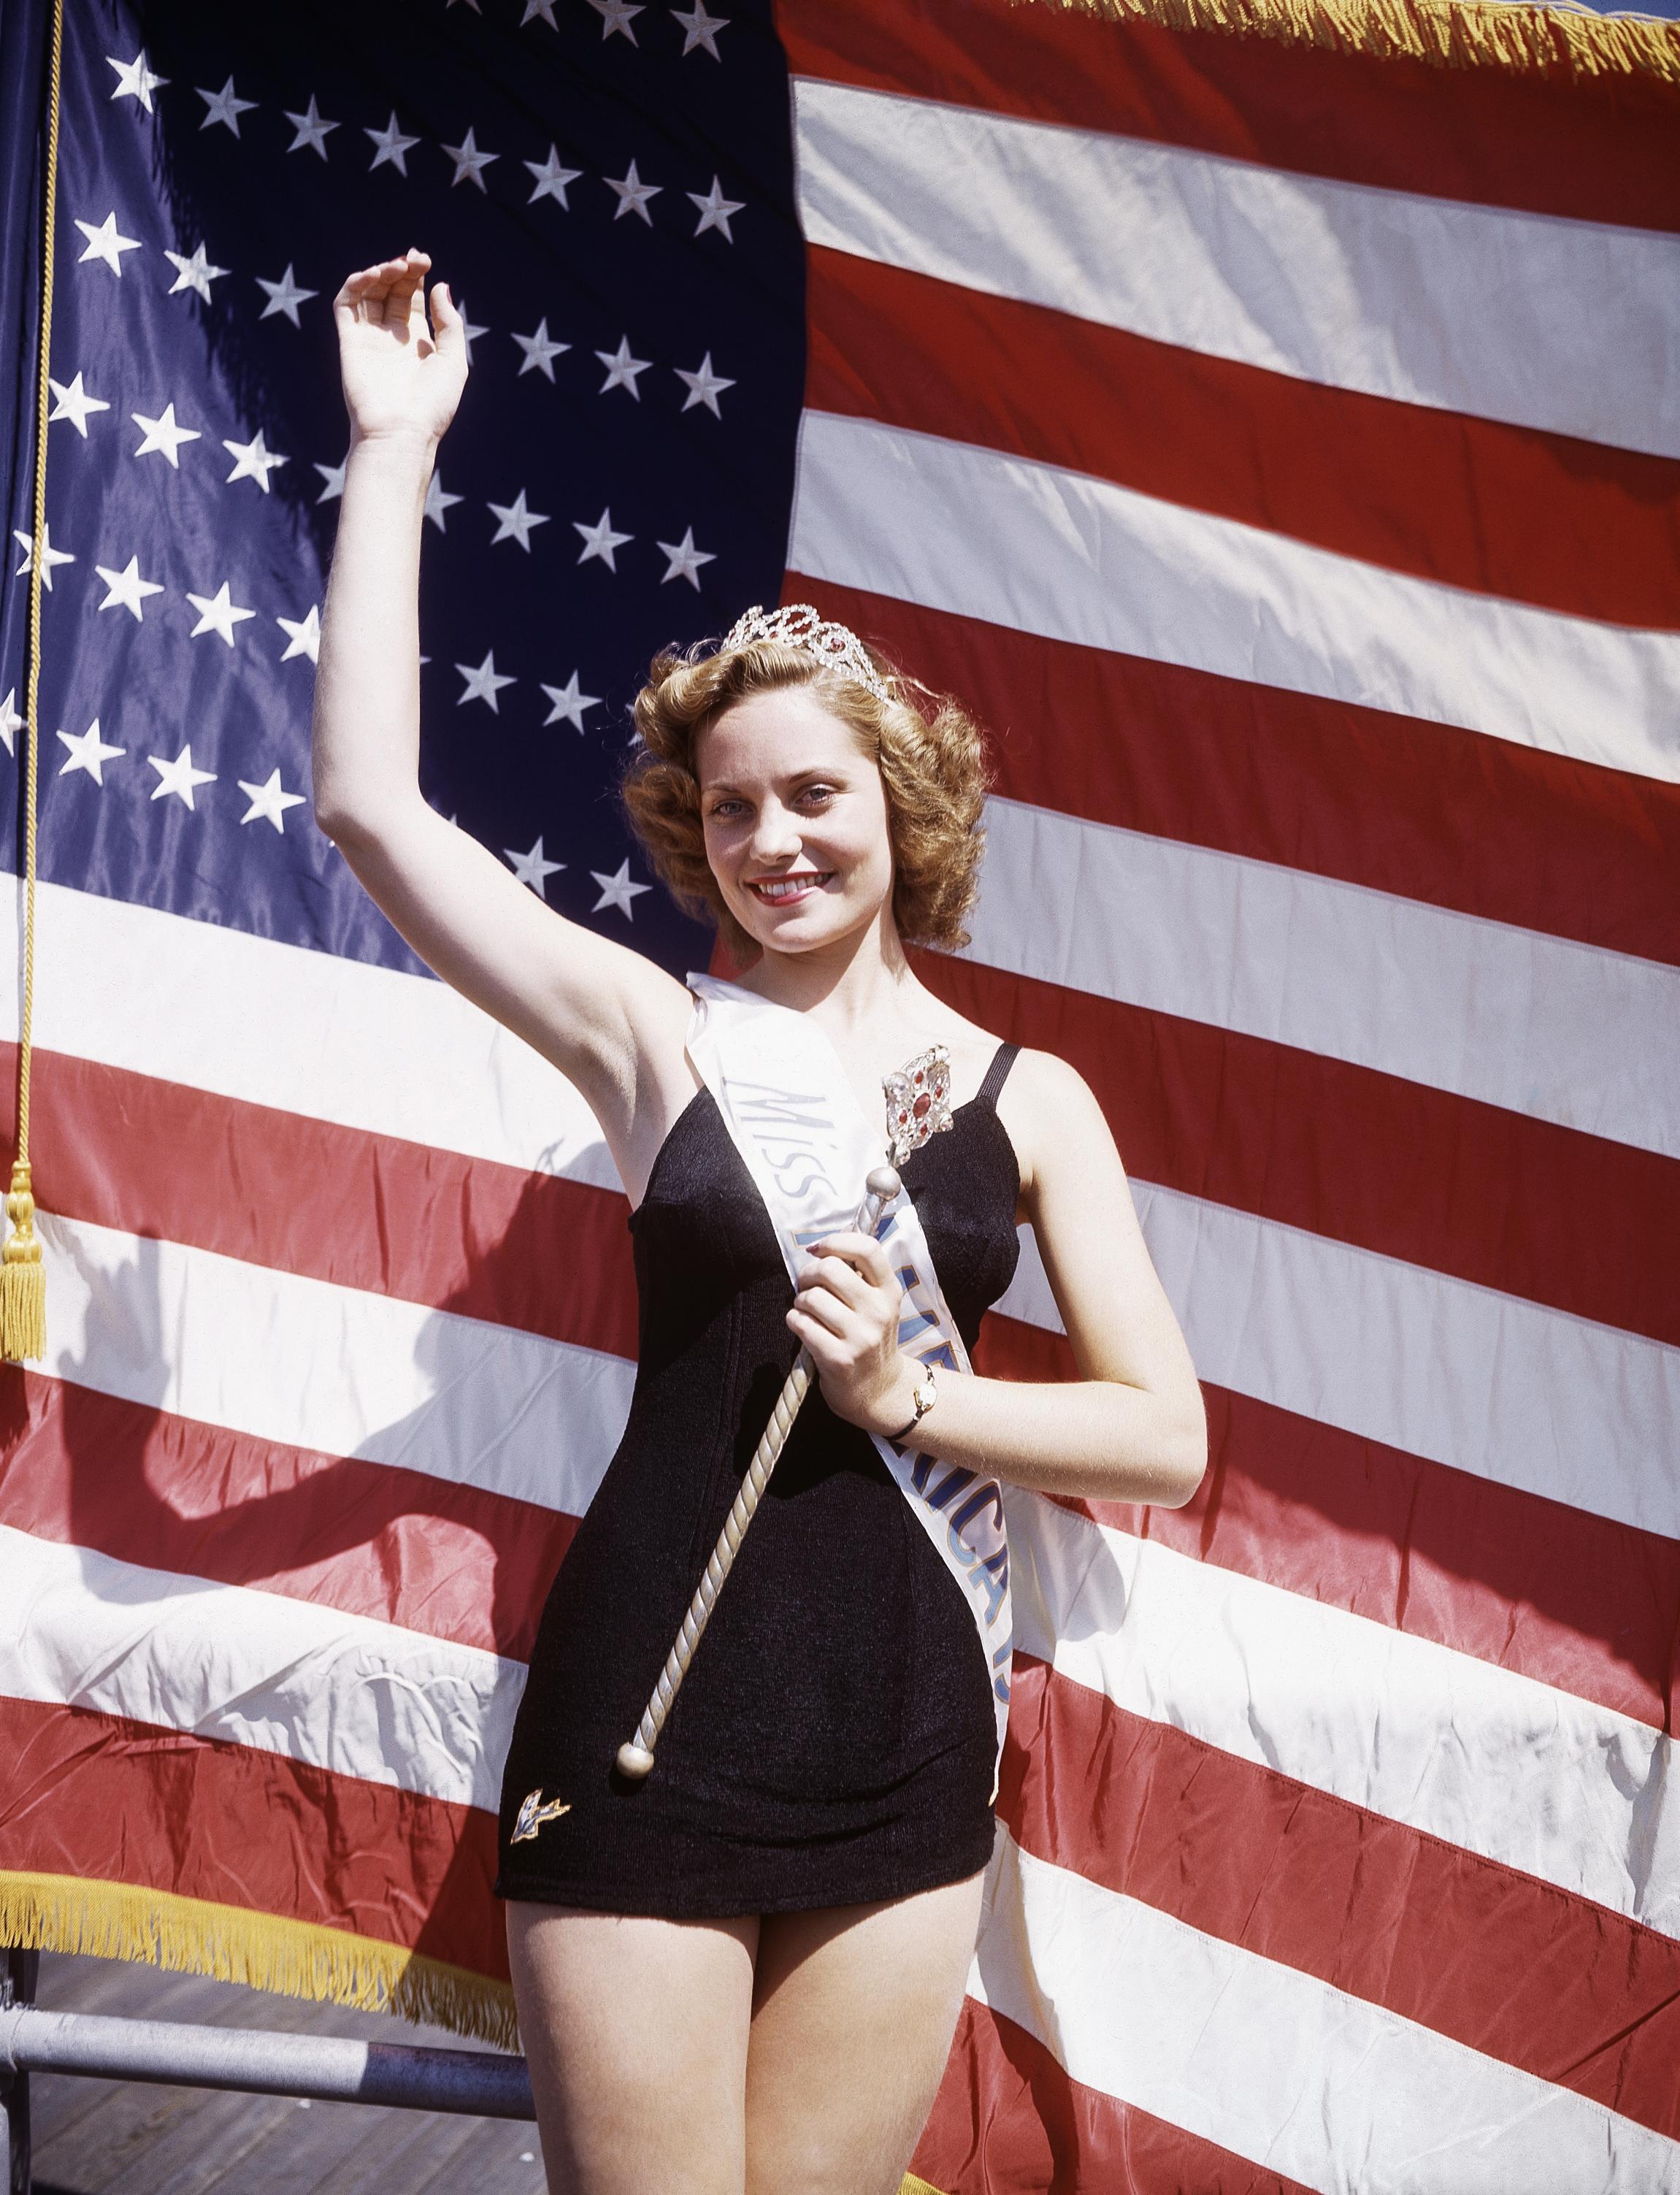 1943: Jean Bartel from Los Angeles